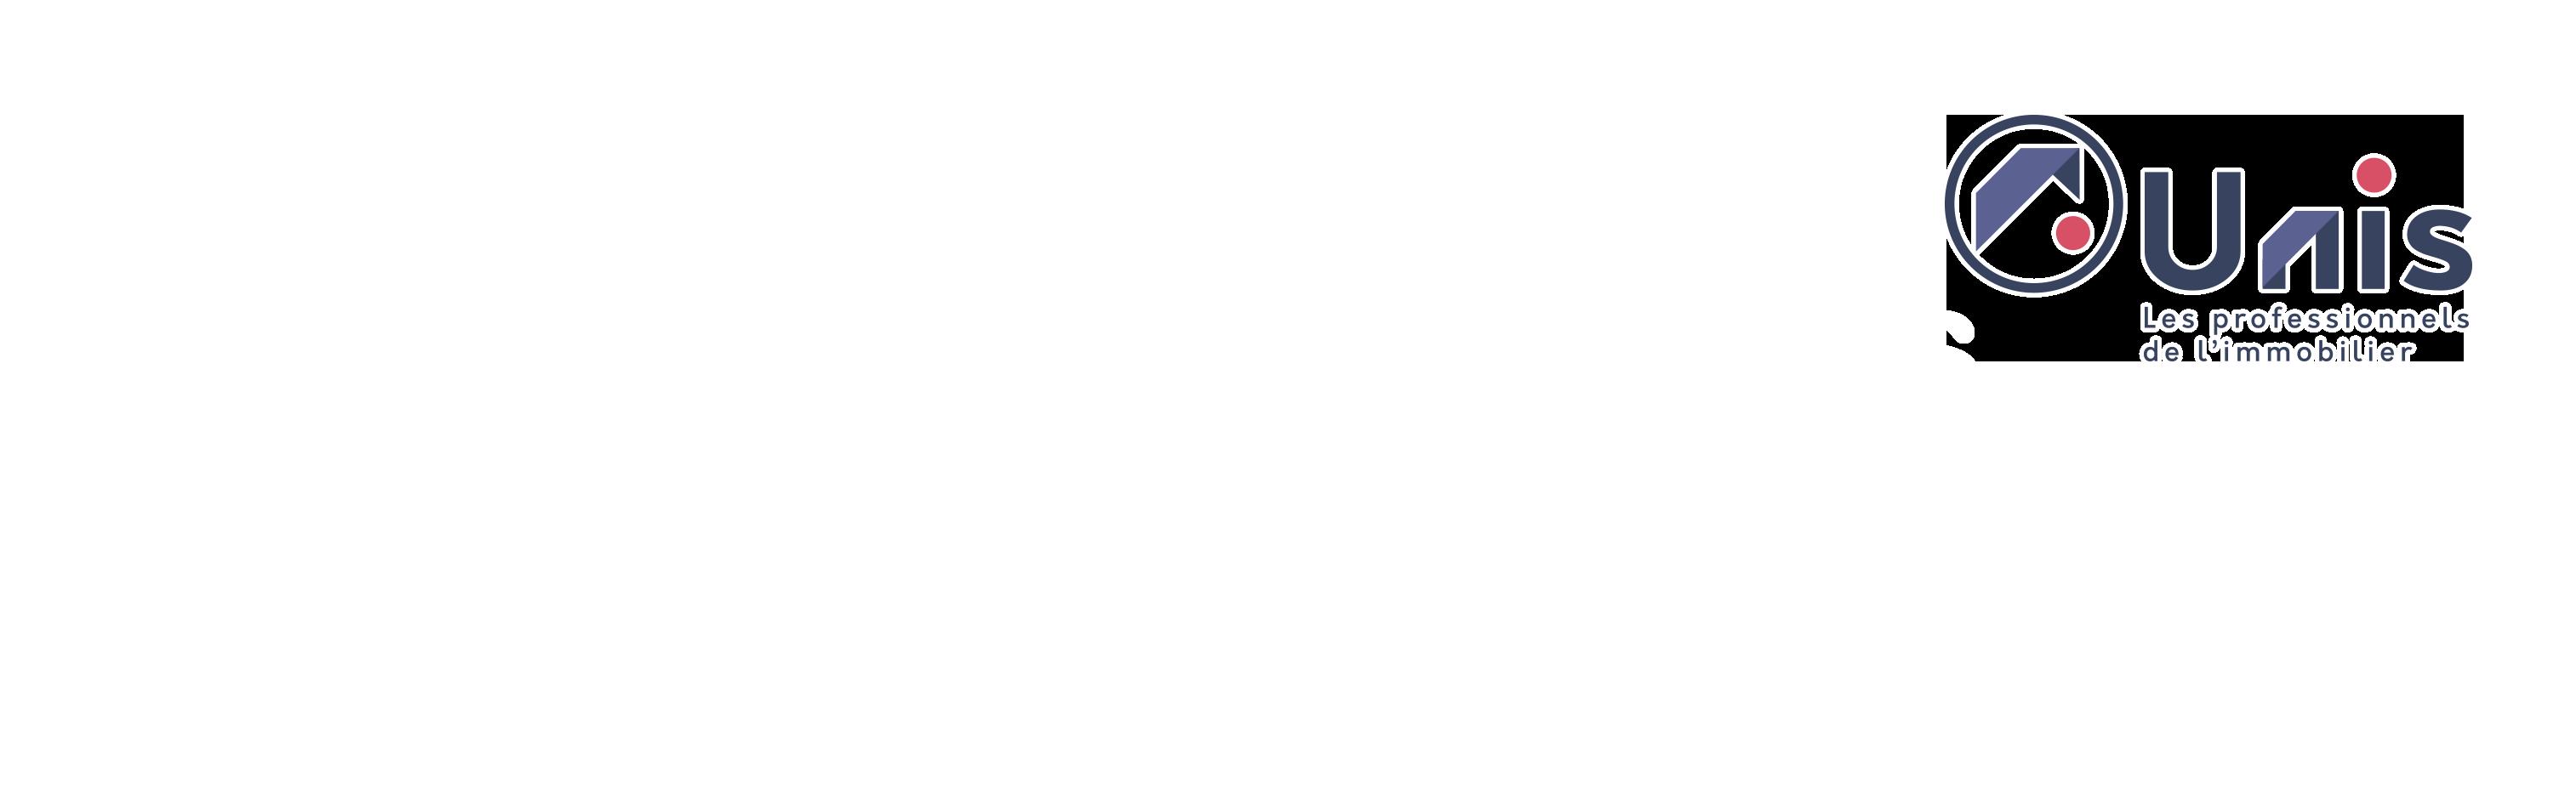 Ile Immo Services